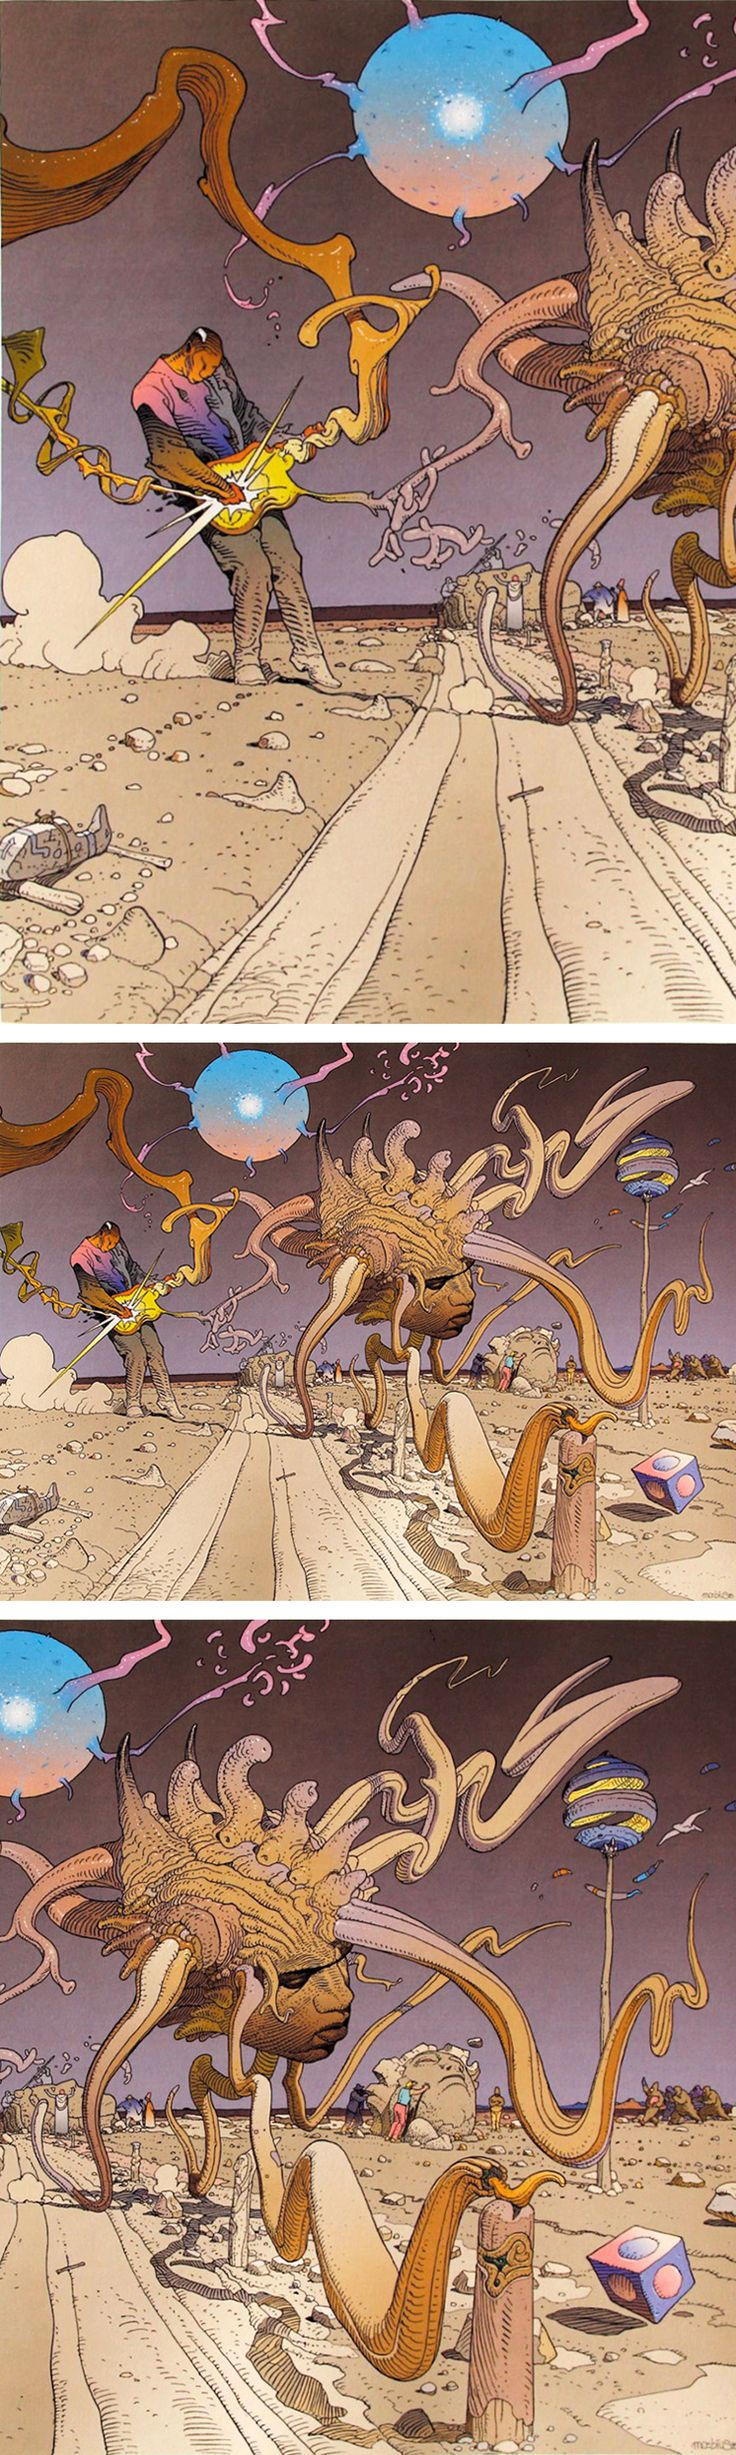 Daily dose of LSD; Jimi Hendrix art by Moebius